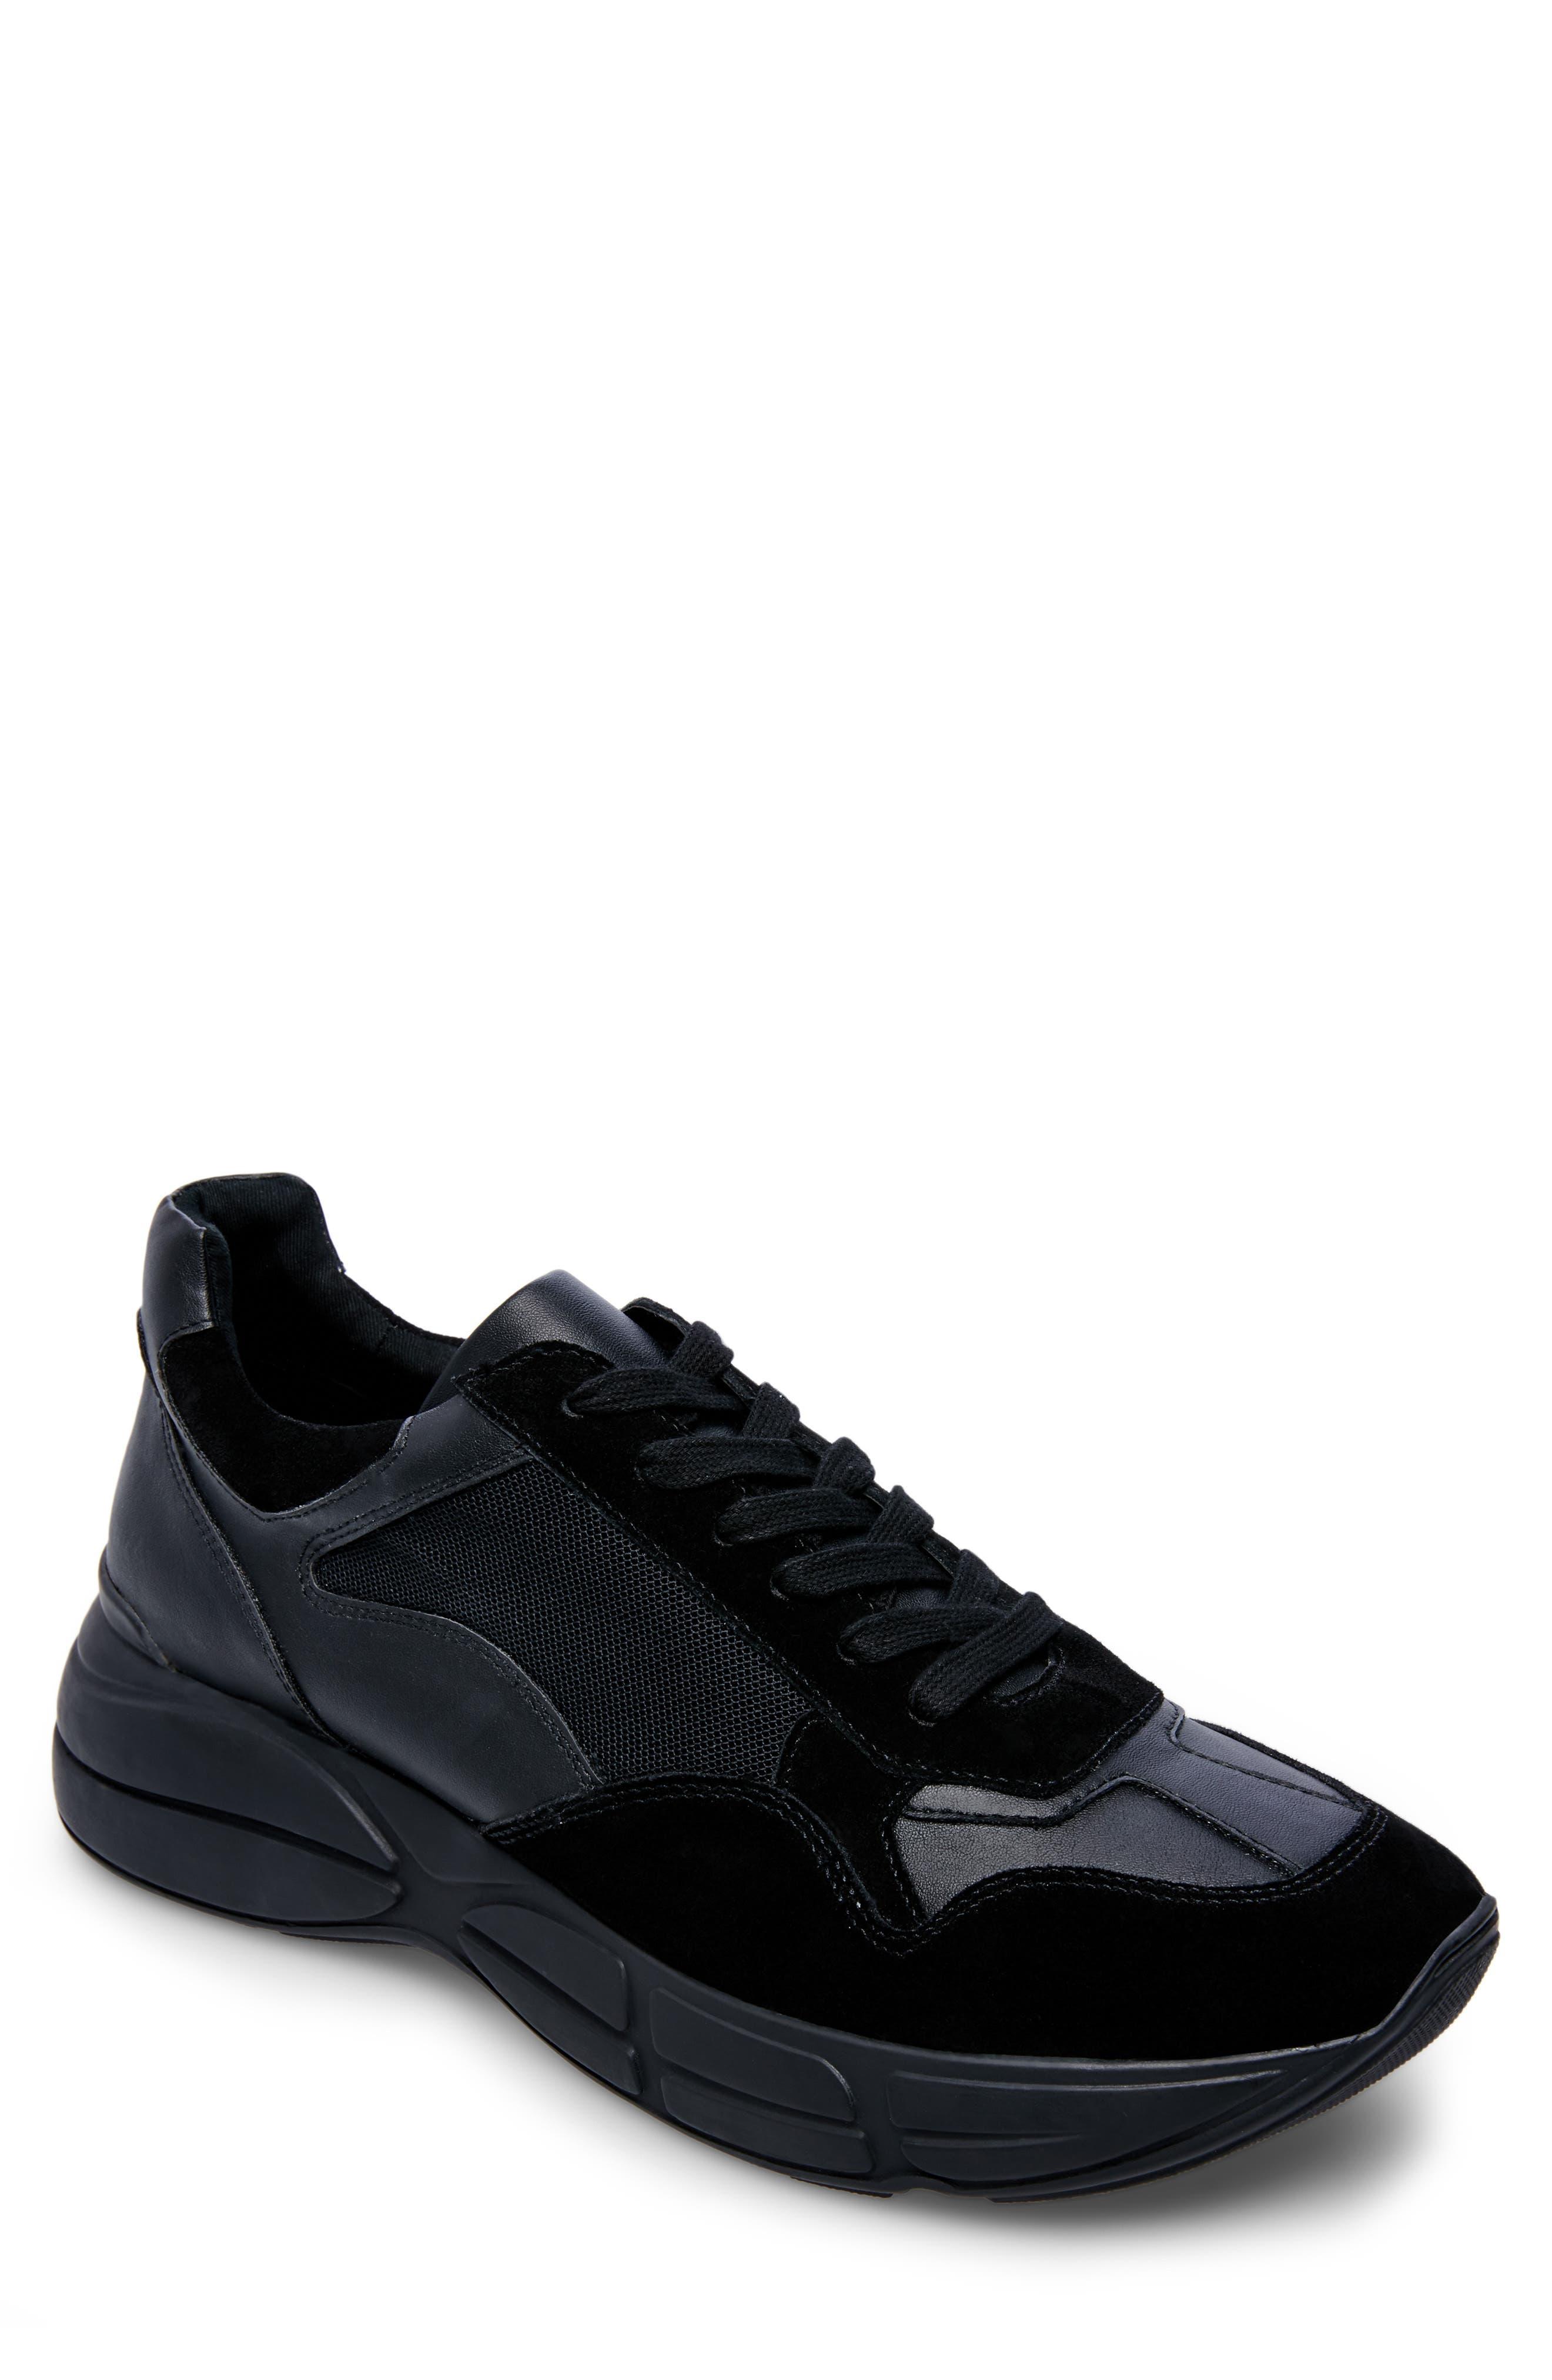 Cole Sneaker,                         Main,                         color, 002